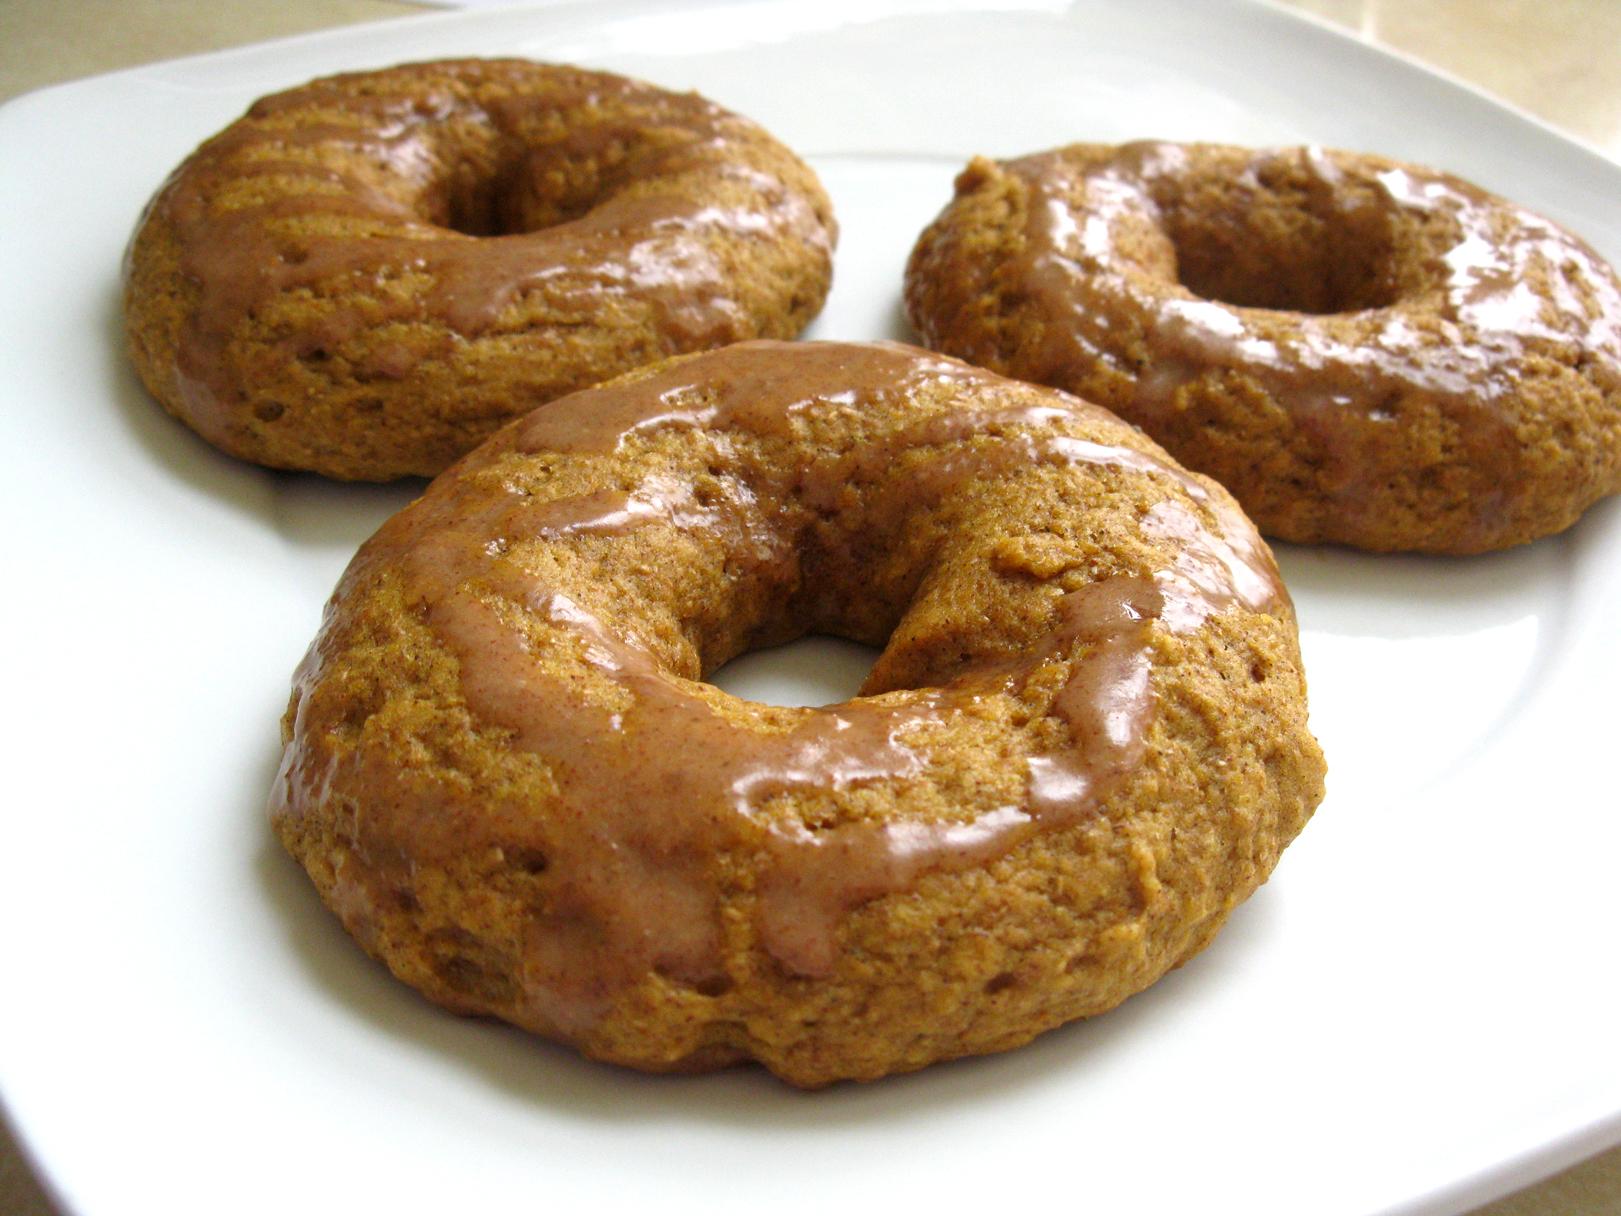 Cinnamon-Glazed Baked Pumpkin Doughnuts | Live. Learn. Love. Eat.